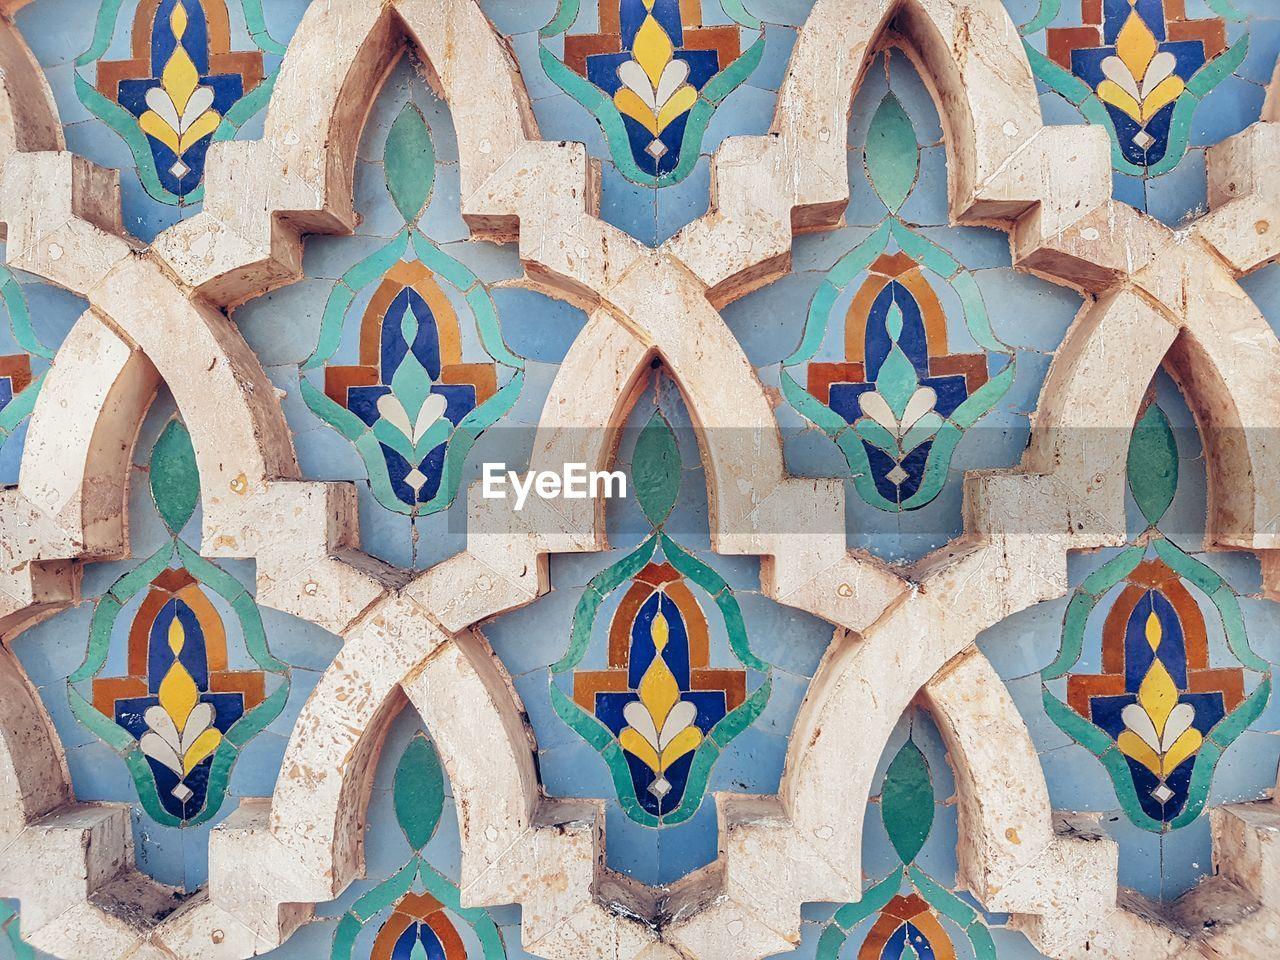 Close-up of mosaic on wall